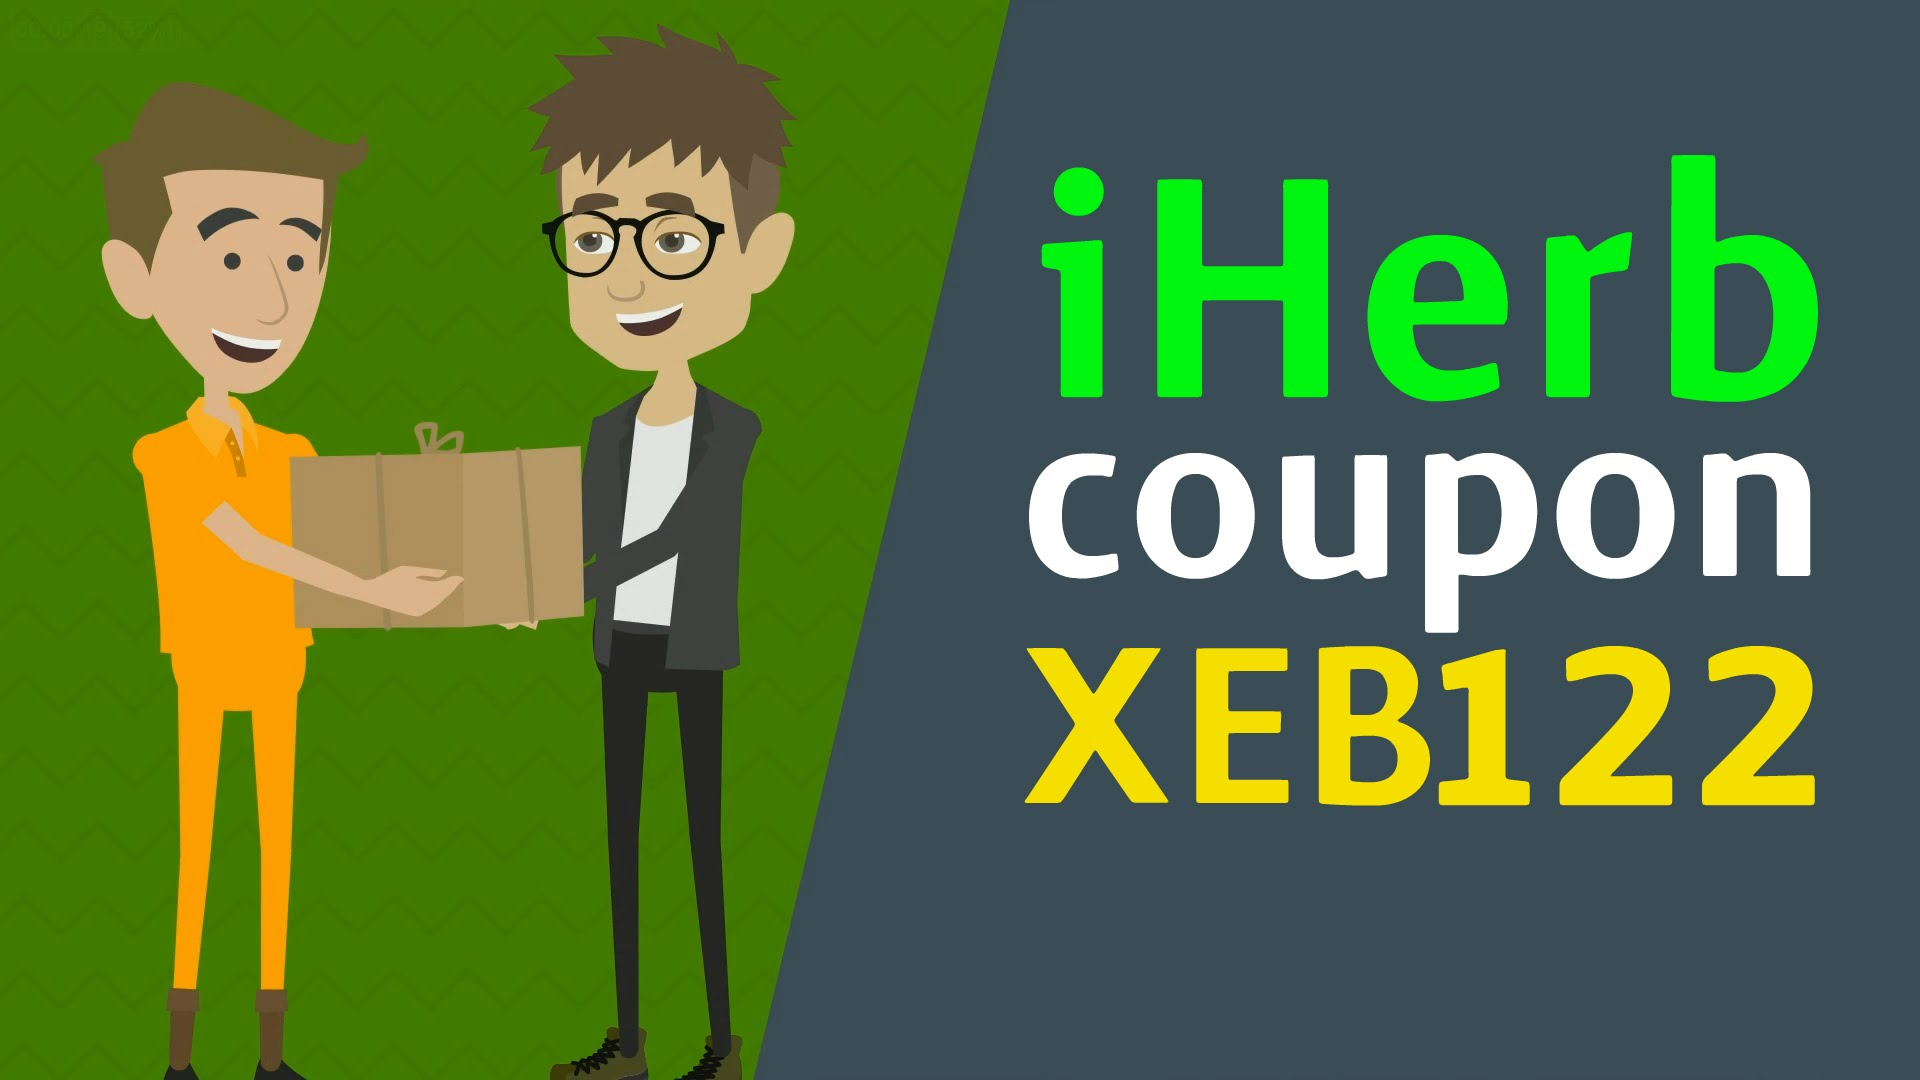 iHerb Coupon Code